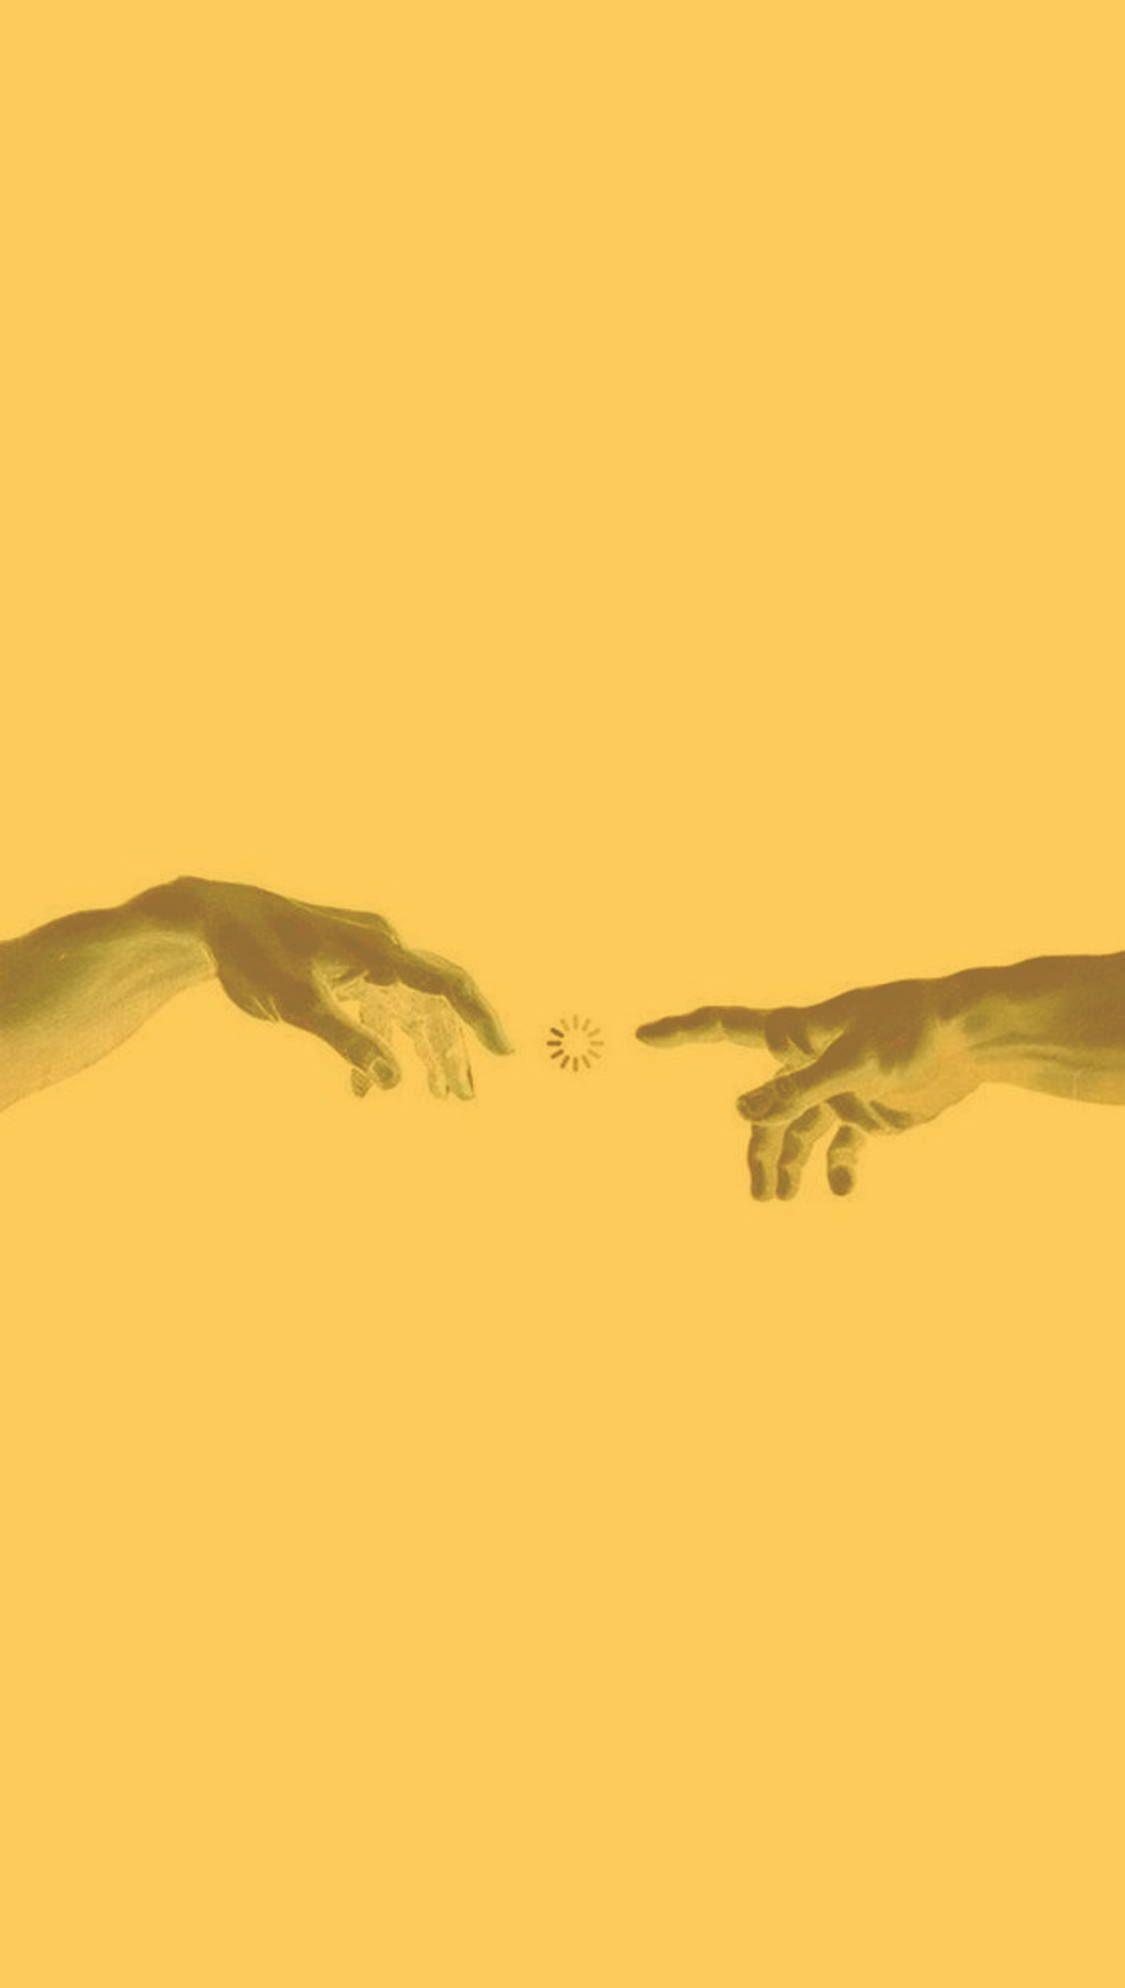 Aesthetic In 2020 Yellow Aesthetic Pastel Yellow Aesthetic Black Aesthetic Wallpaper